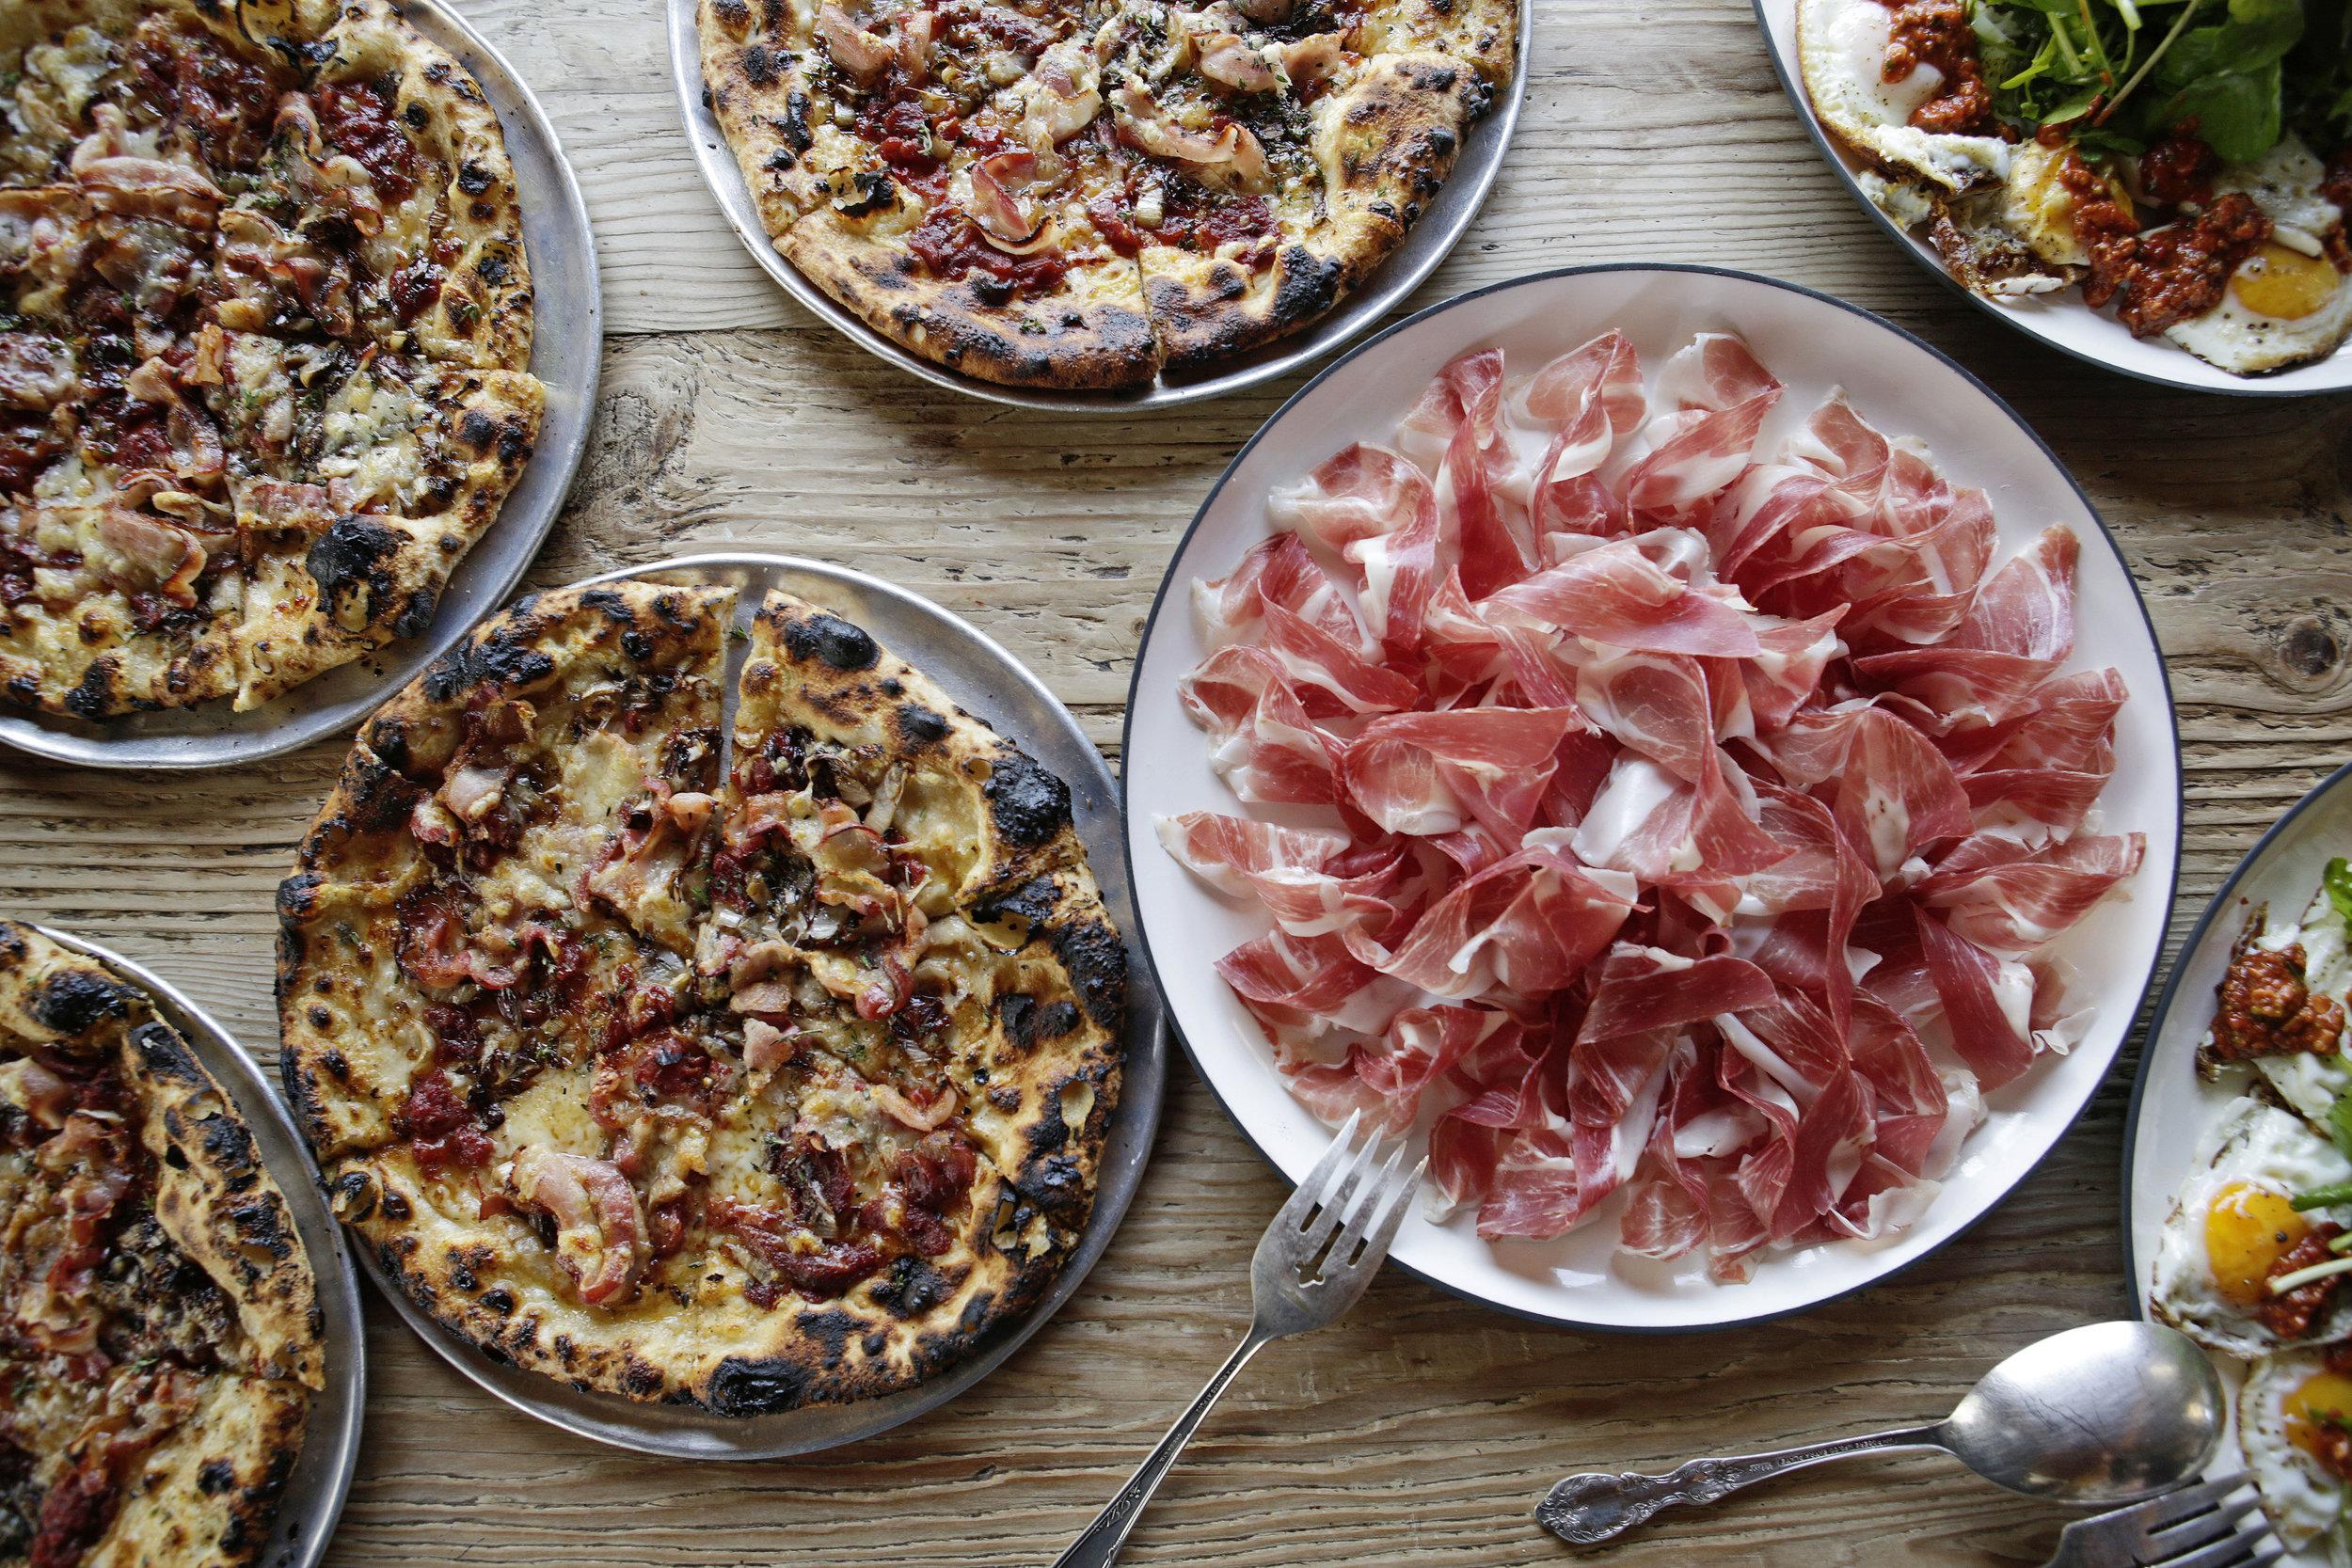 Food_Gjust_JanessaLeone_21a1815.jpg